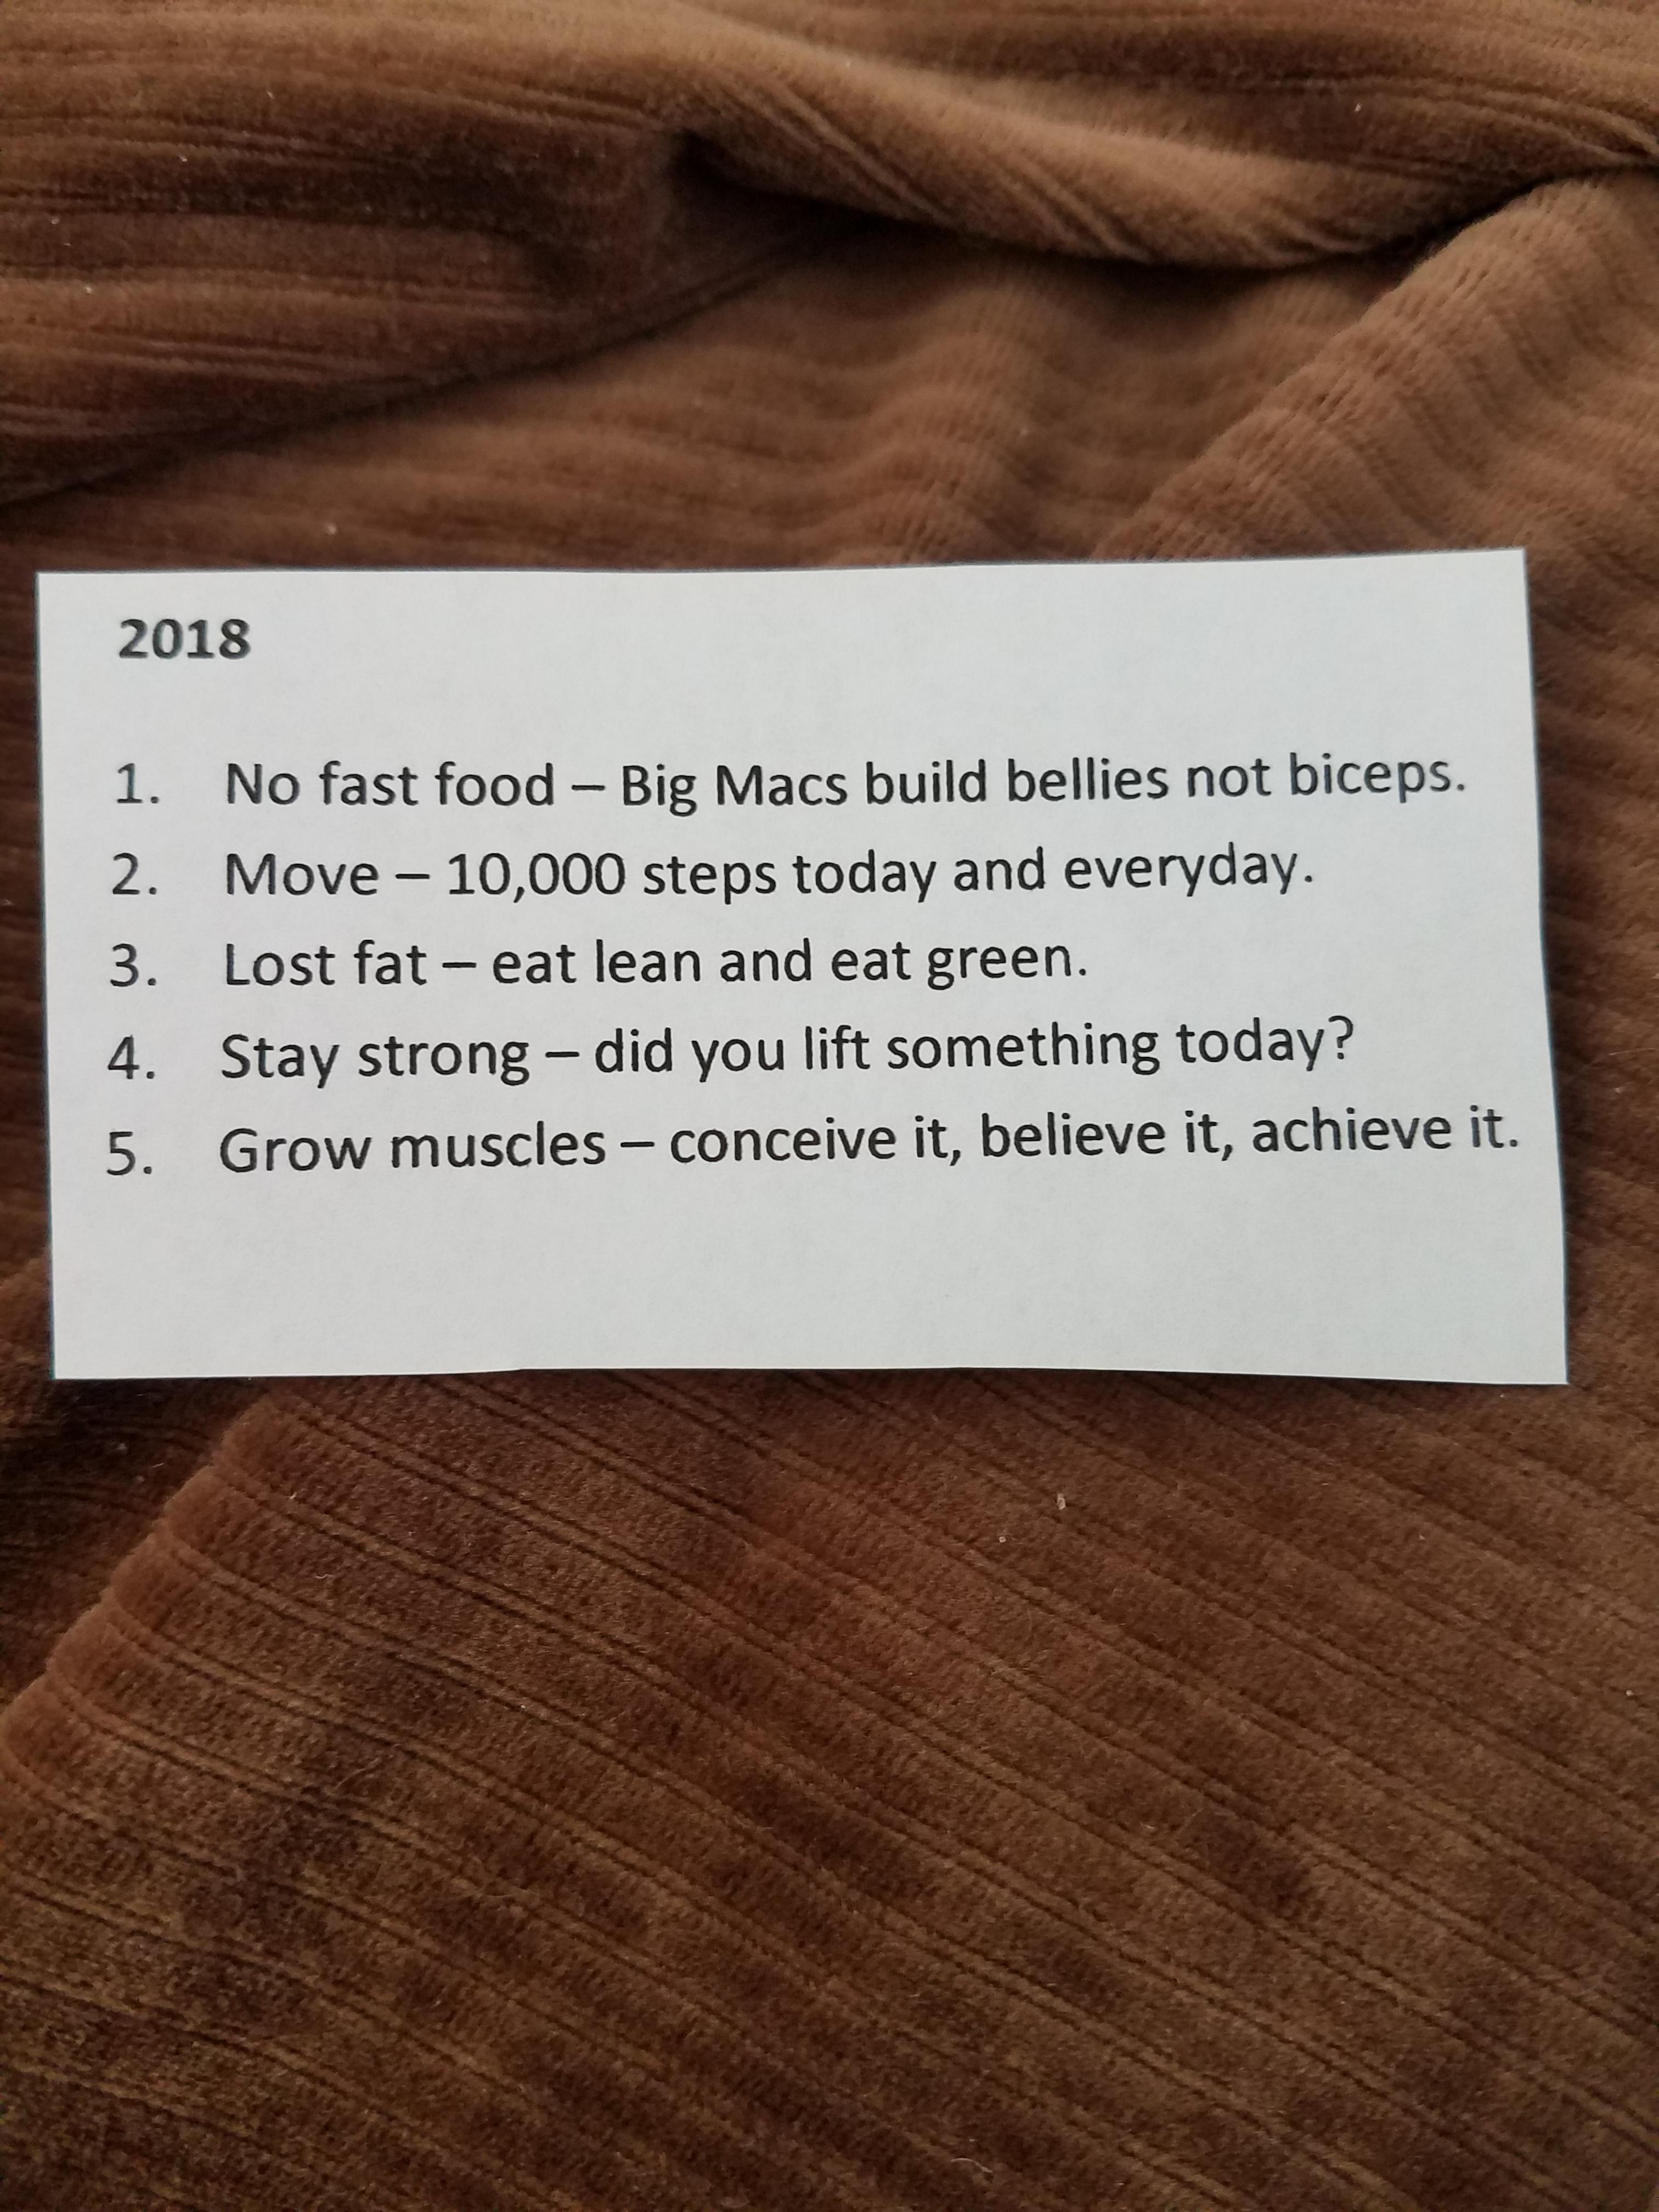 2018 Goals